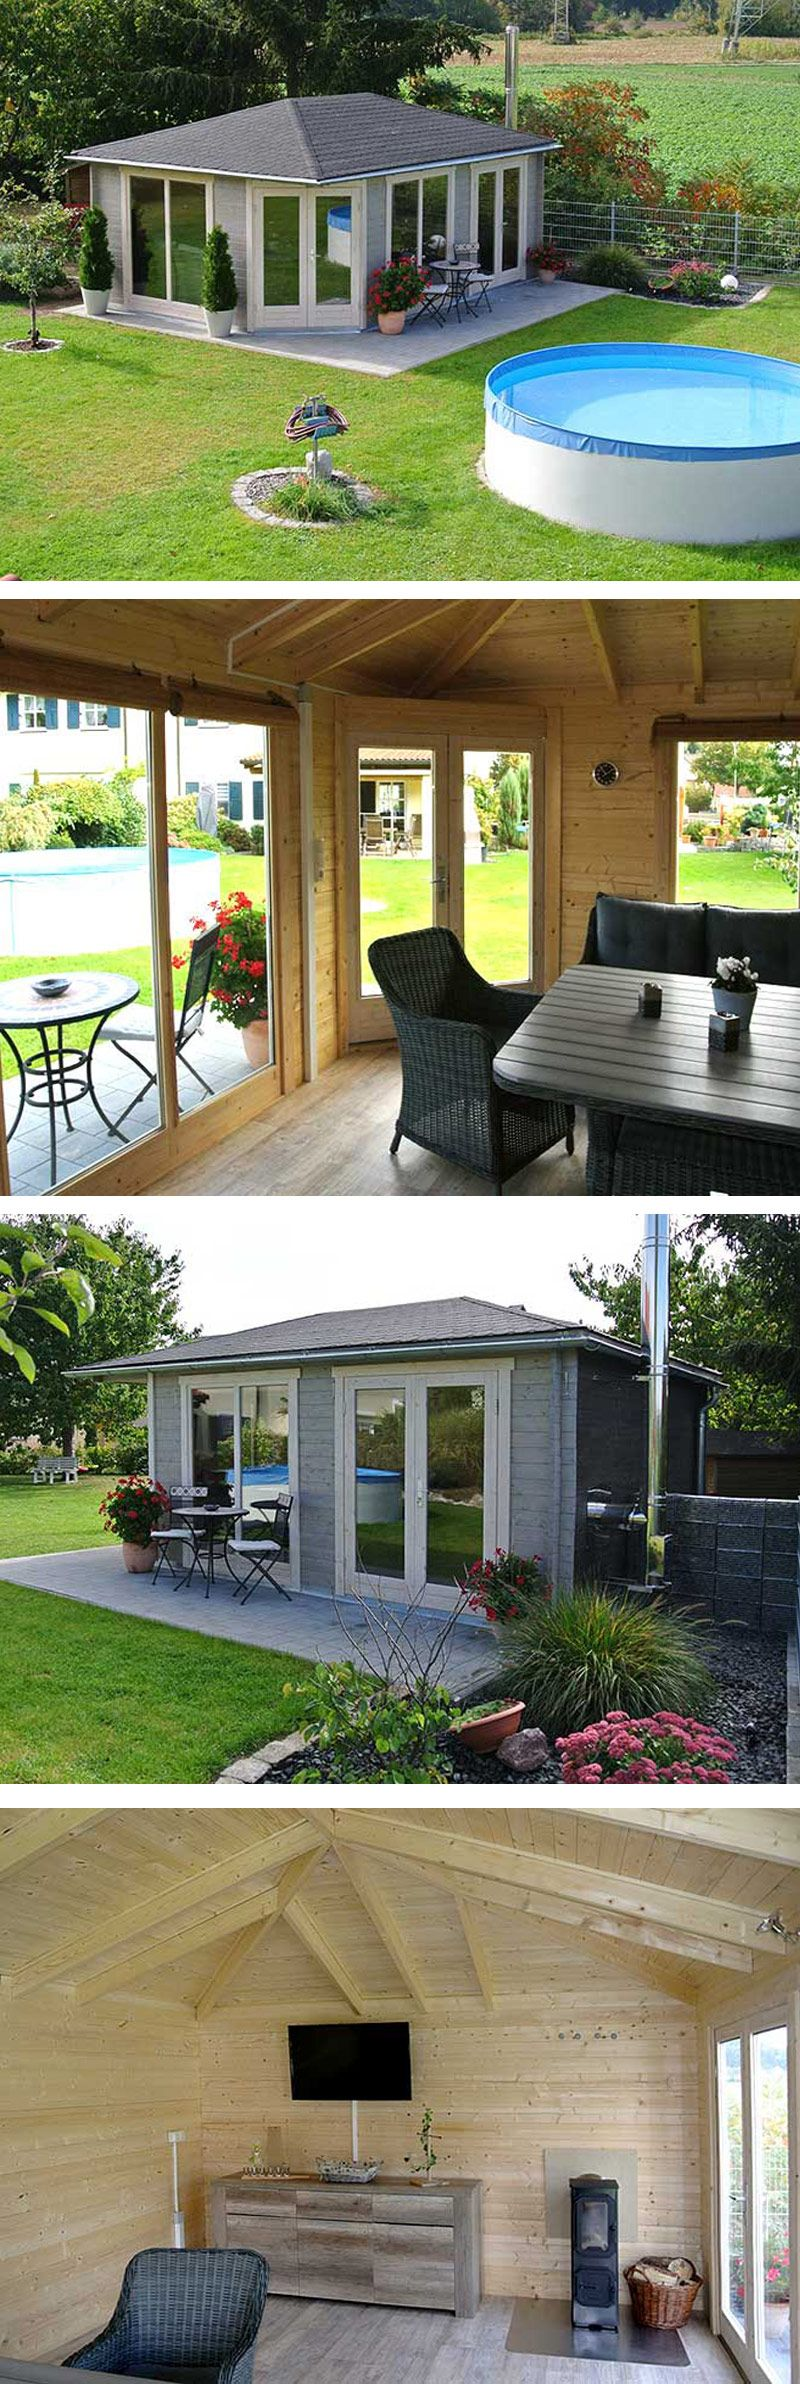 5 eck gartenhaus julia 40 aufbau und einrichtung haus ideen pinterest gartenhaus garten. Black Bedroom Furniture Sets. Home Design Ideas